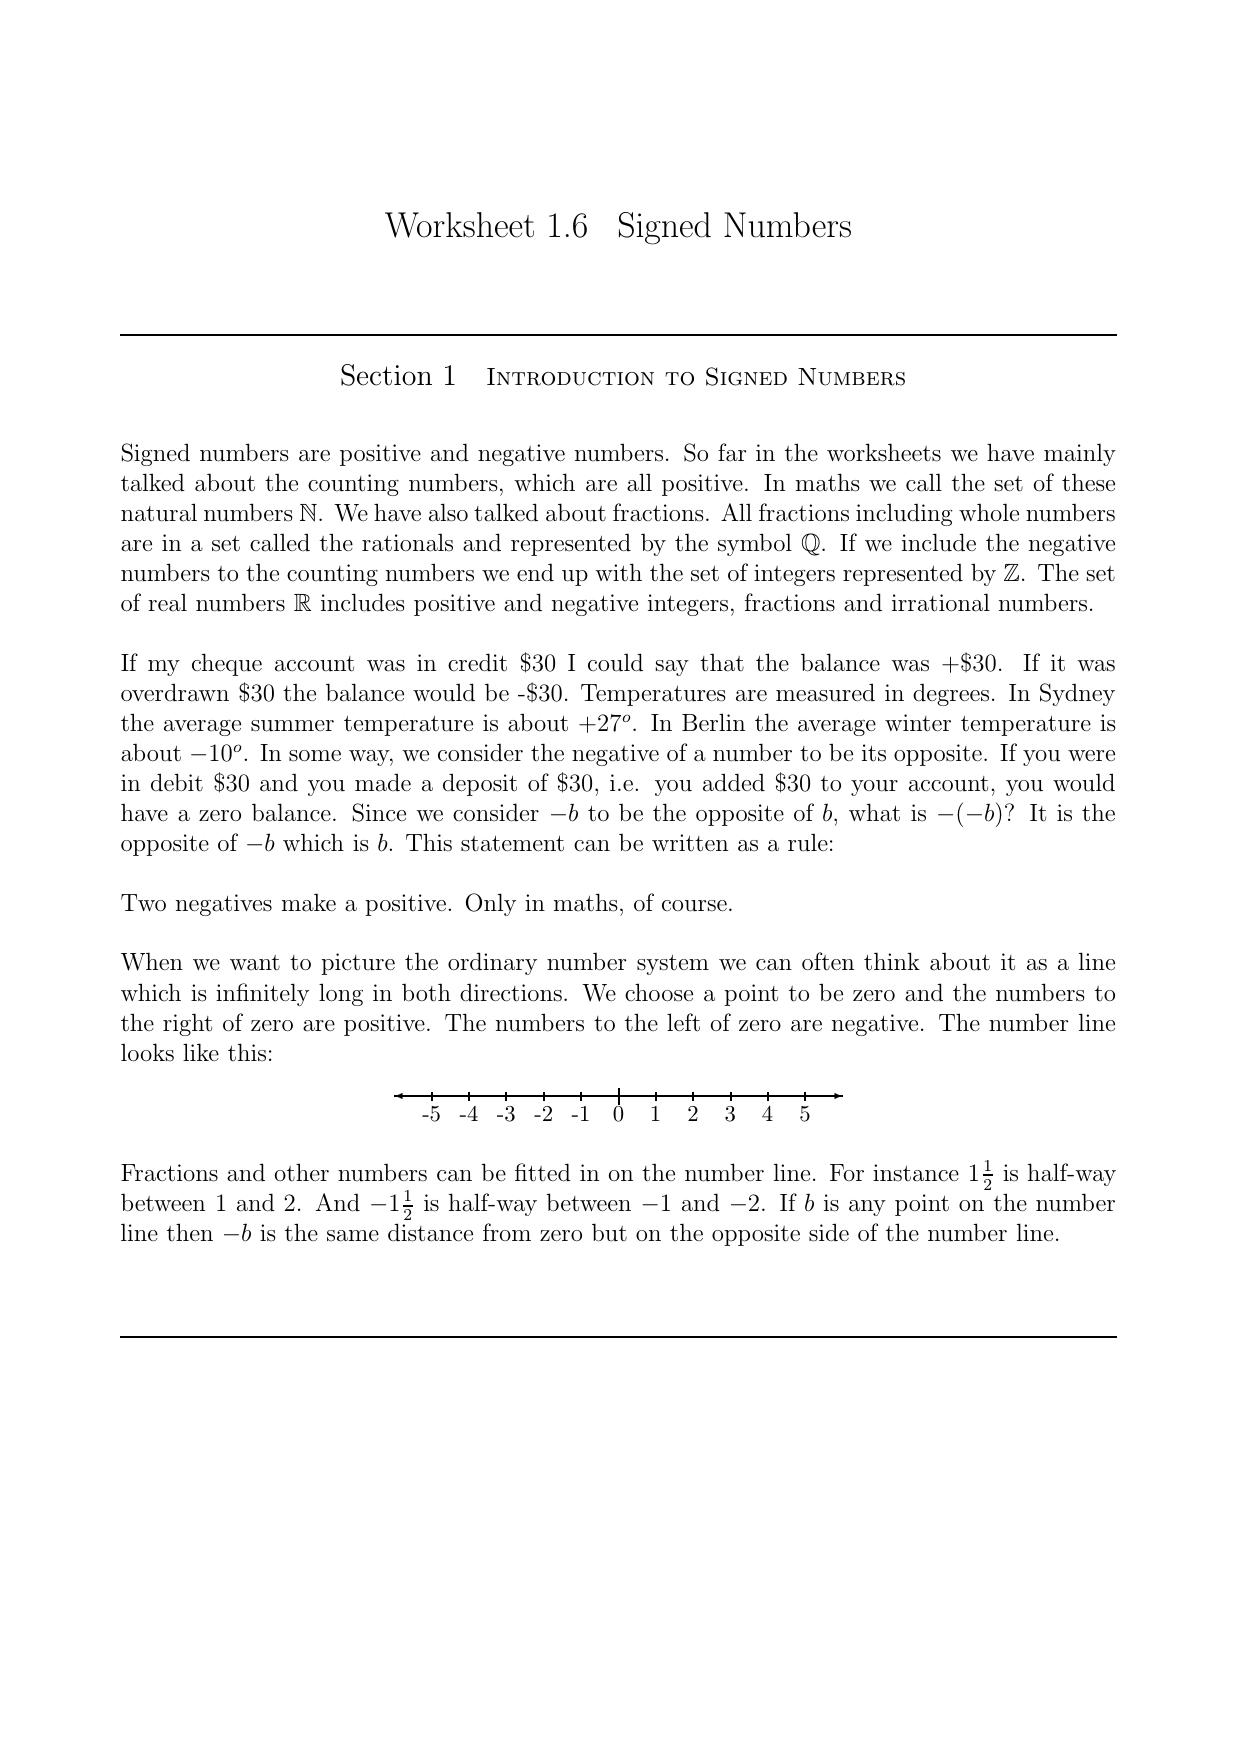 Worksheets Signed Numbers Worksheet worksheet 1 6 signed numbers